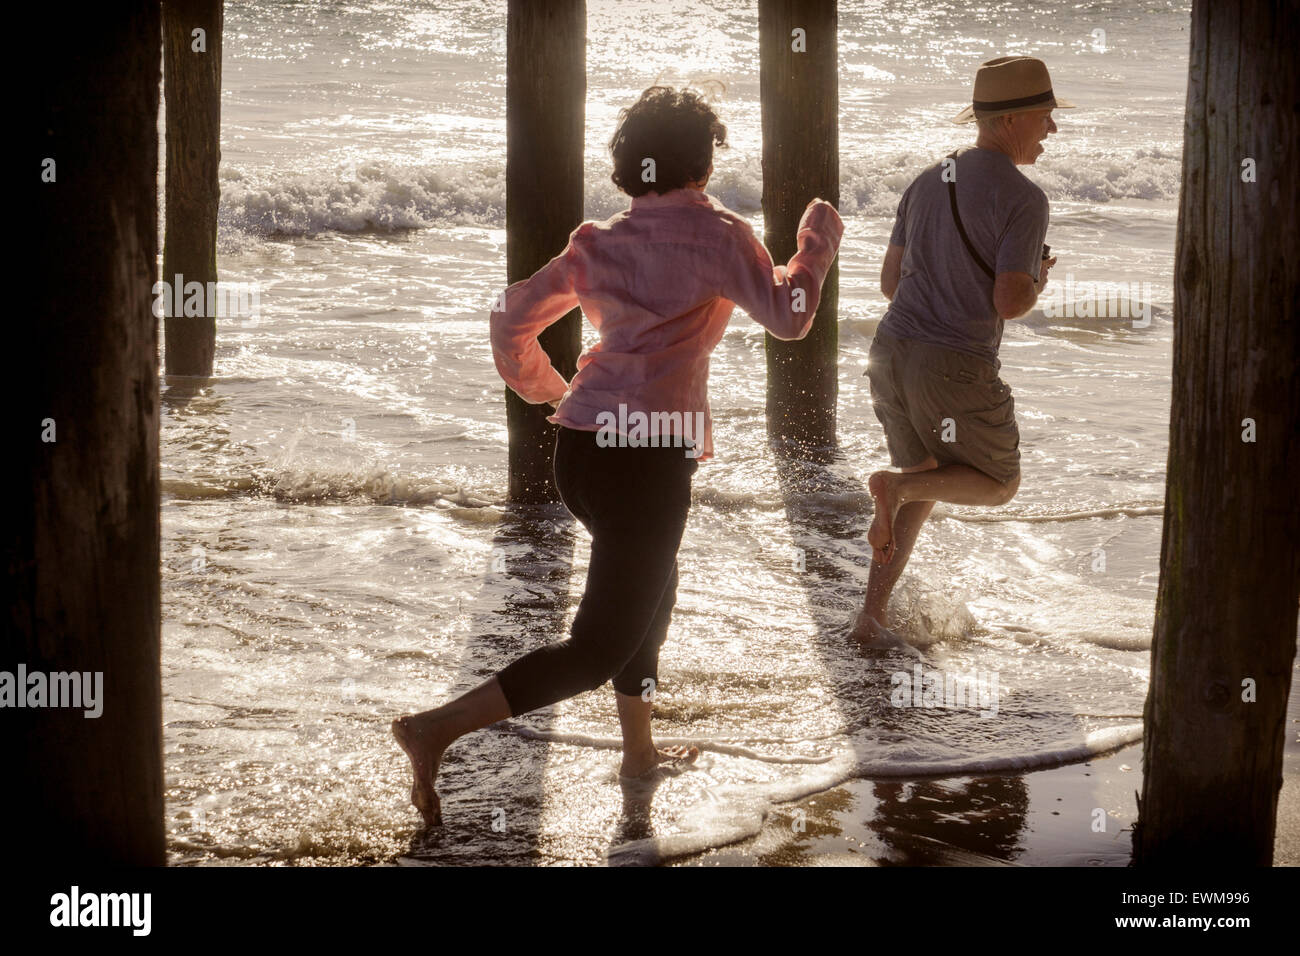 Woman chasing a man at the beach, splashing through water under boardwalk piers - Stock Image